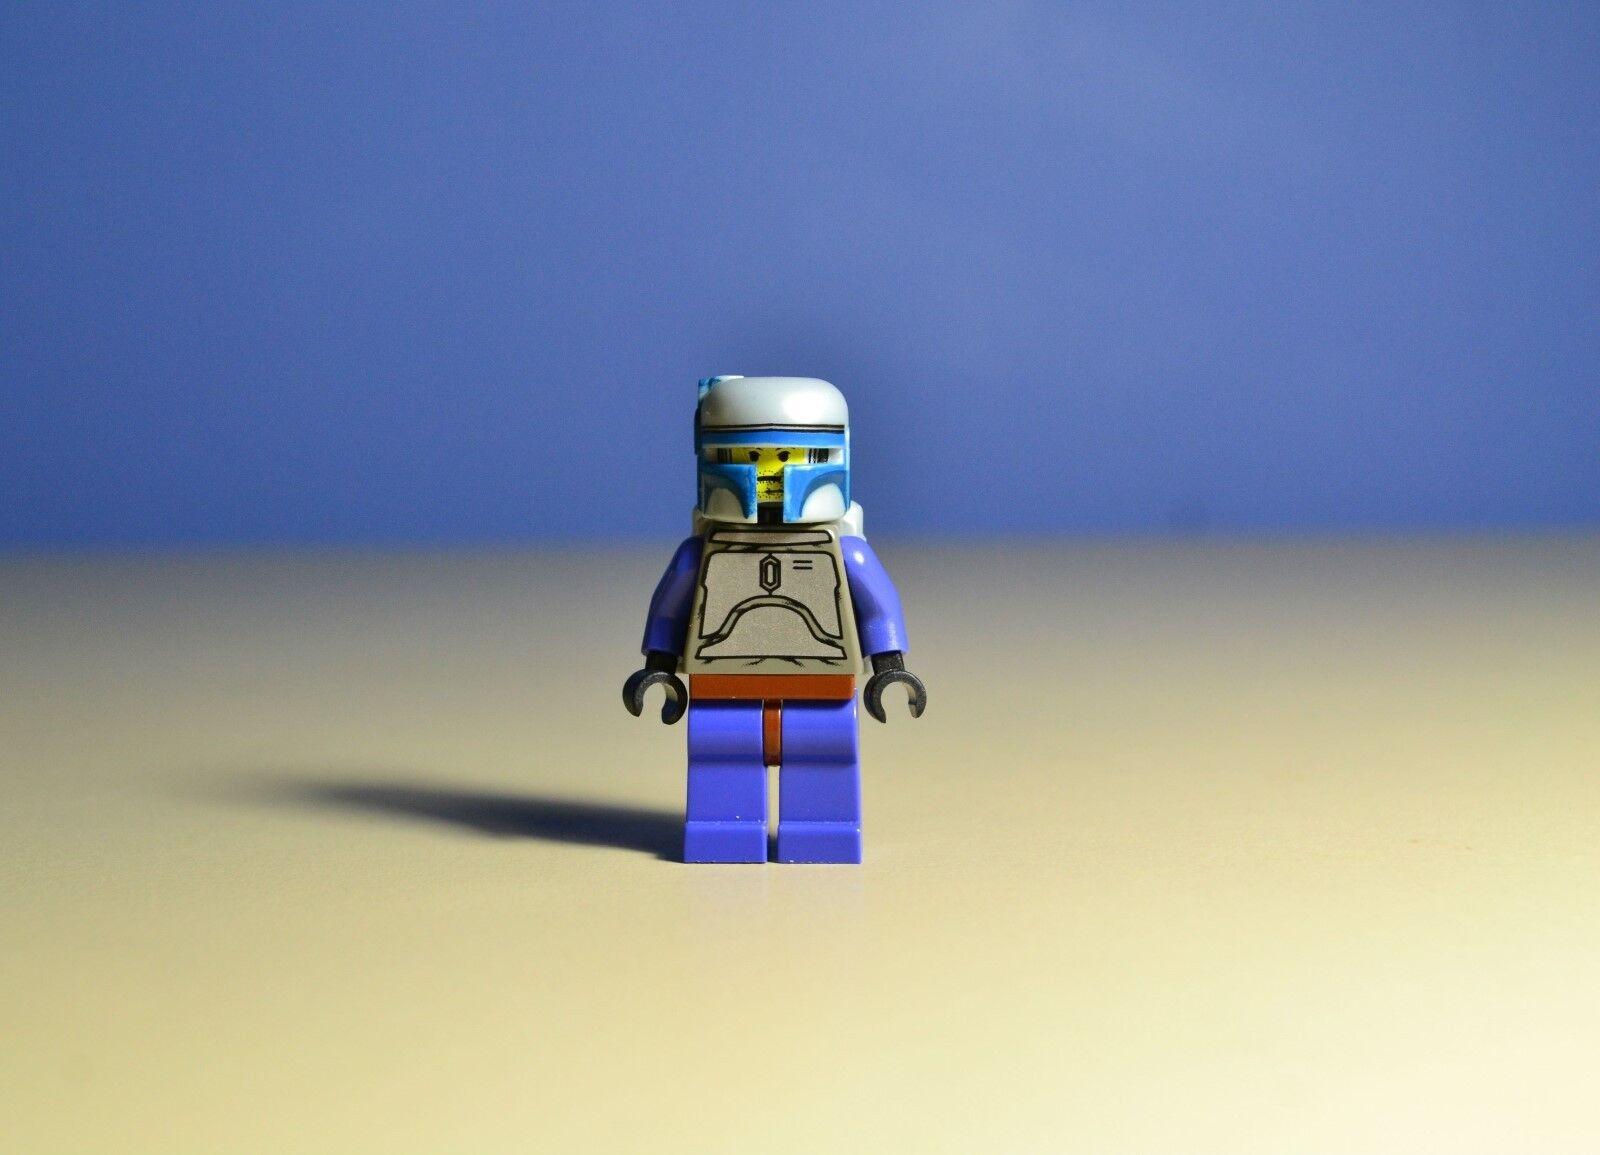 Lego Star Wars Jango Fett Minifigure 7153